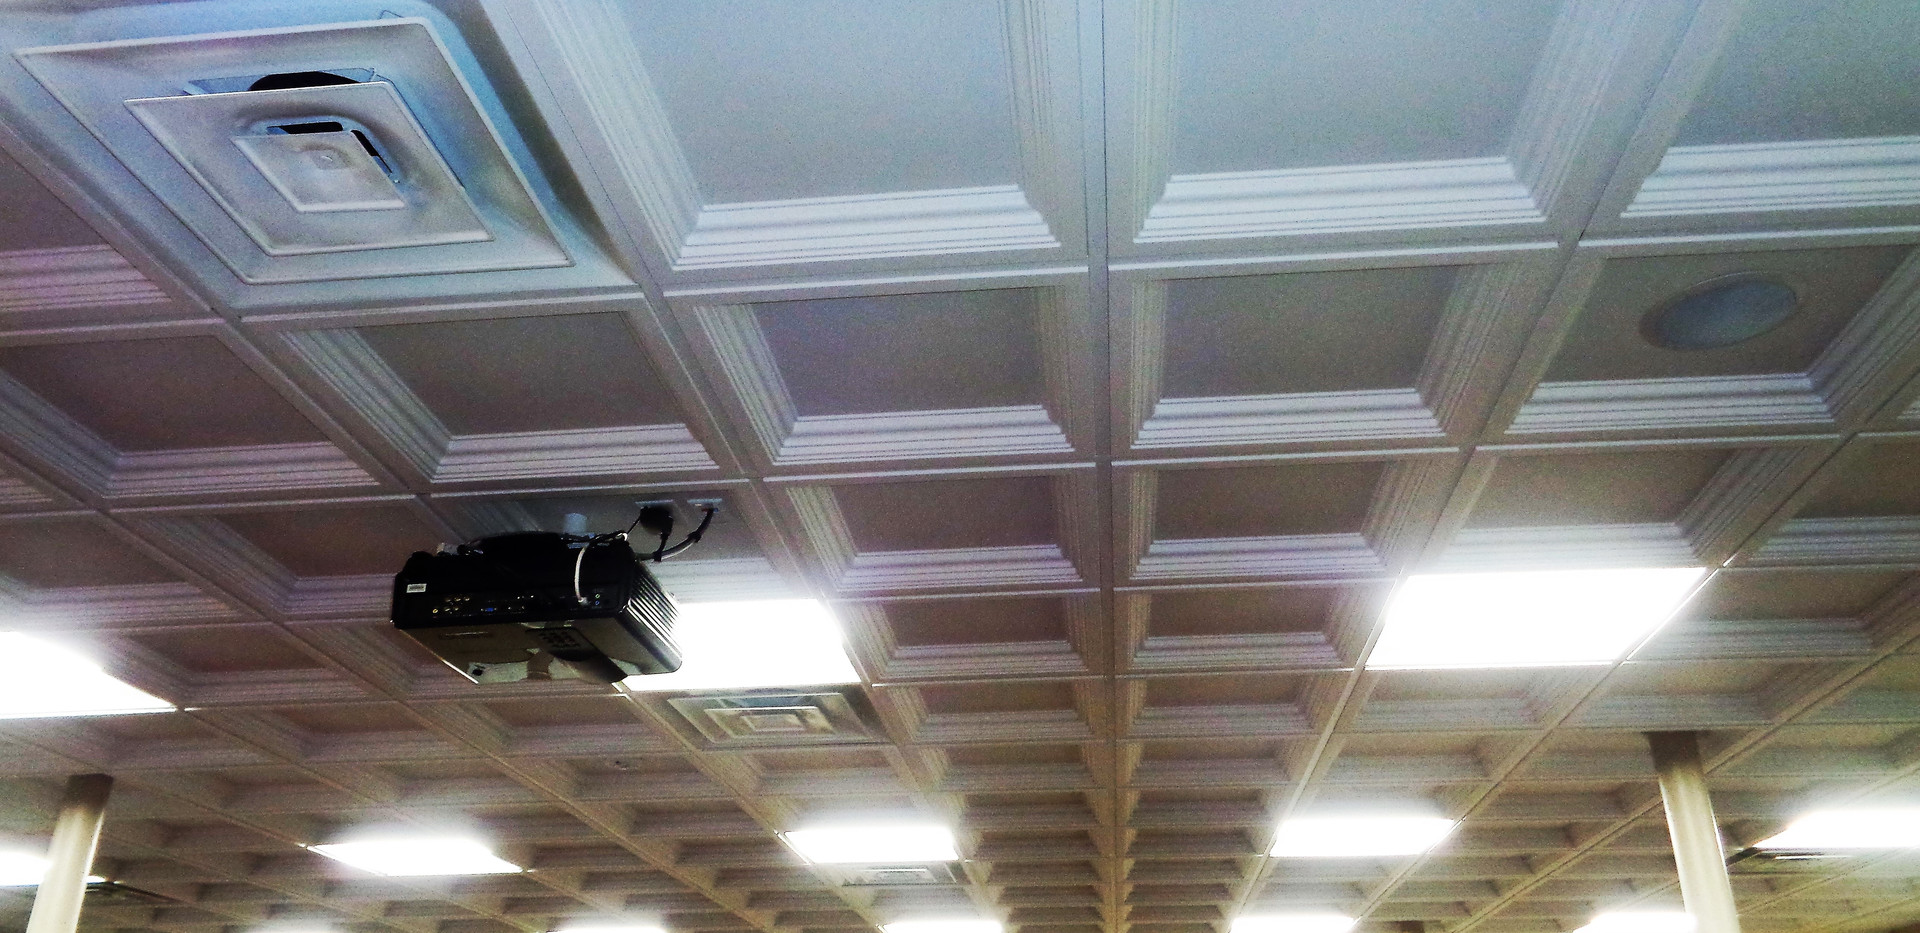 East Hall ceiling.jpg